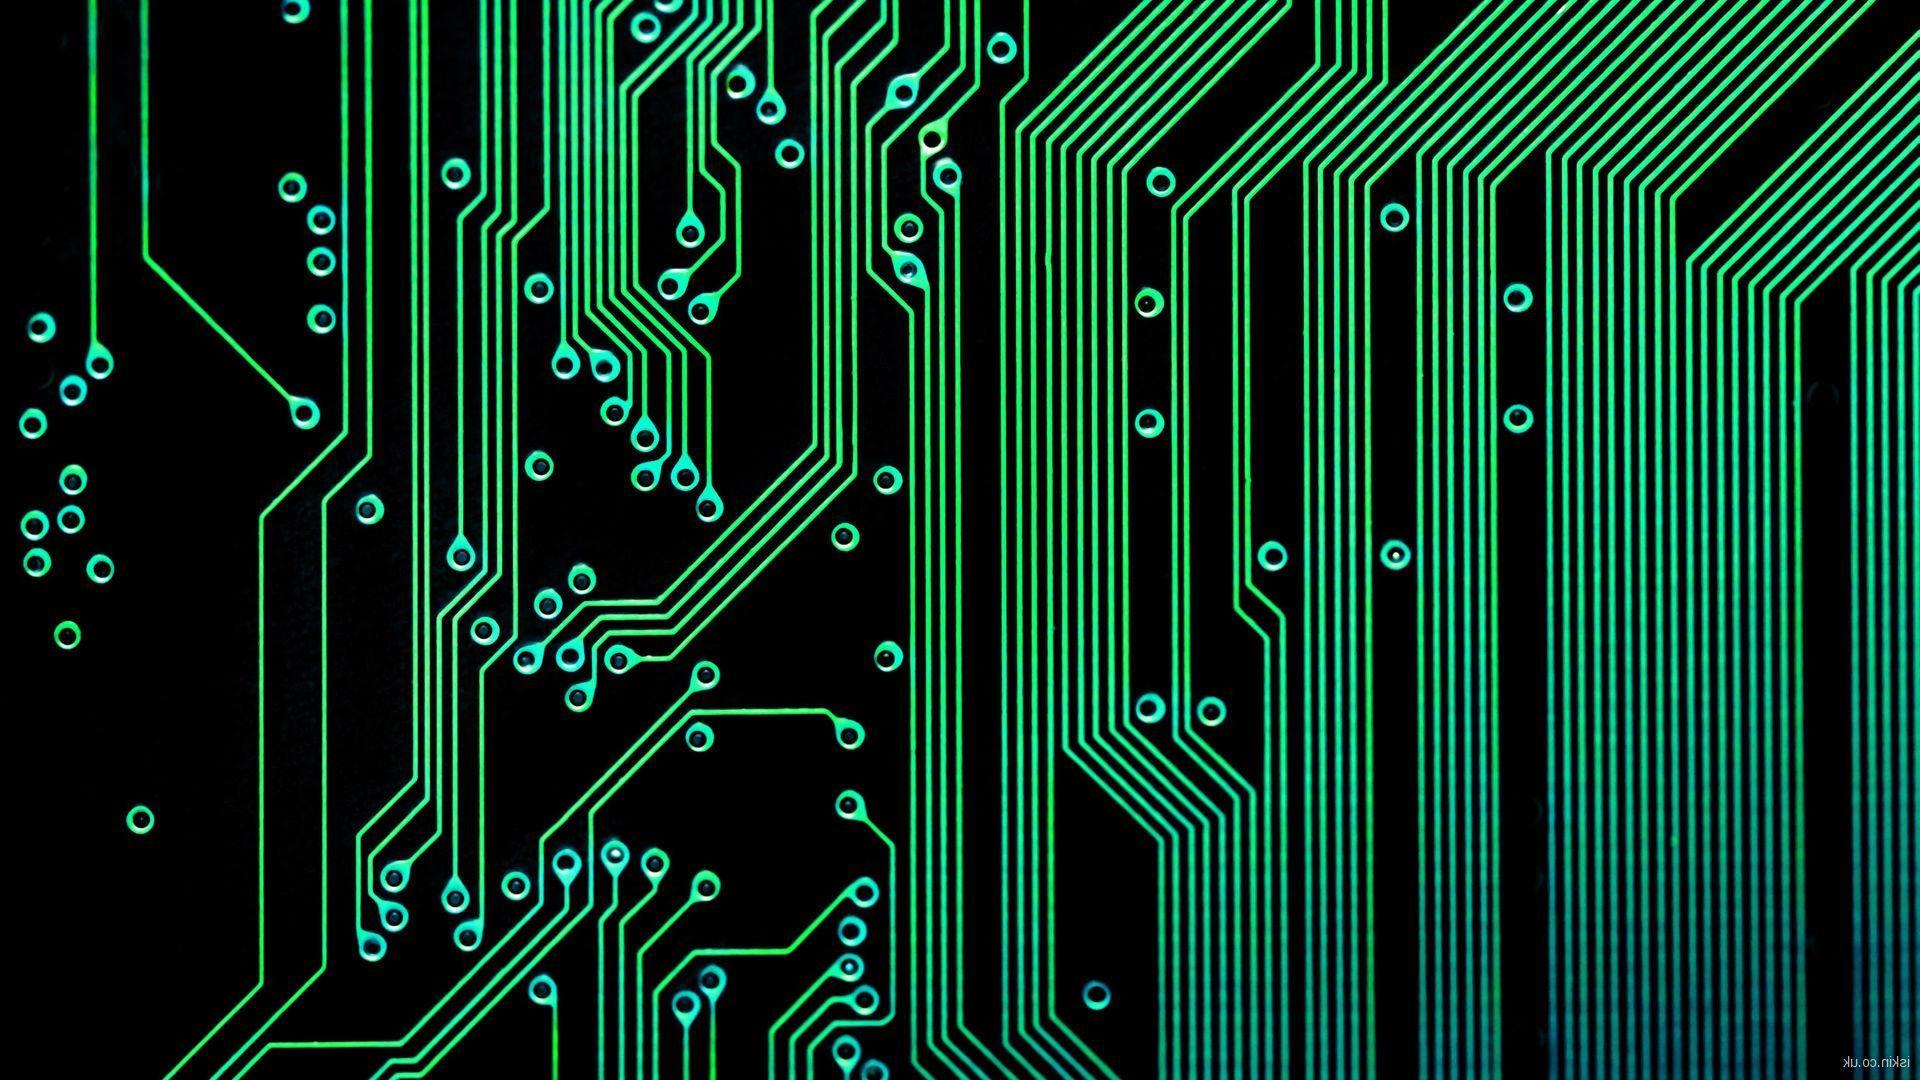 electronic circuit wallpaper [ 1920 x 1080 Pixel ]